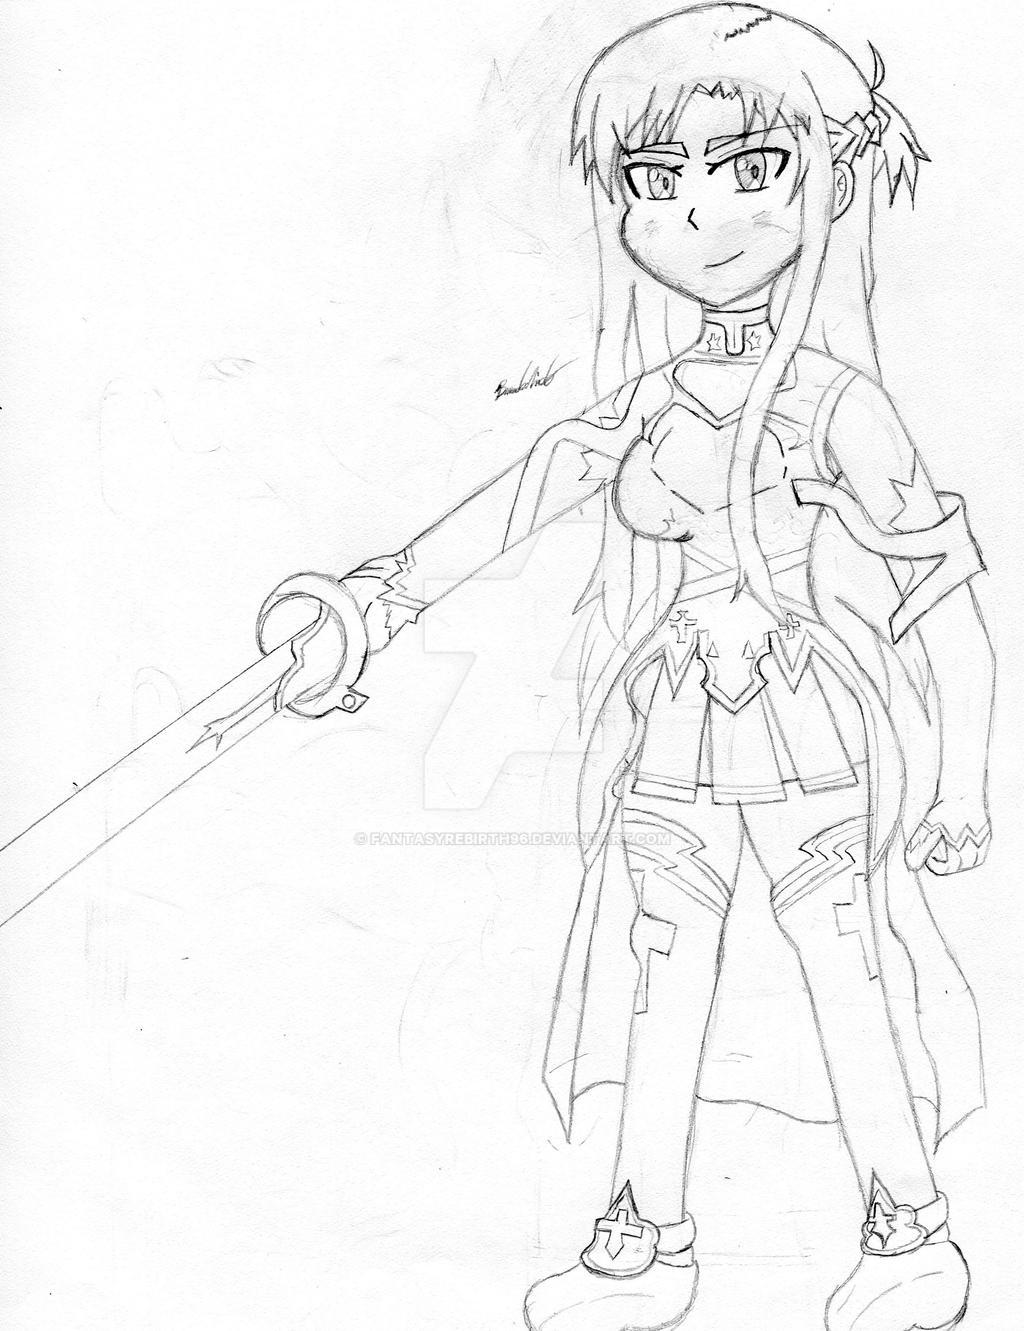 Asuna Drawing (Plus Update) by FantasyRebirth96